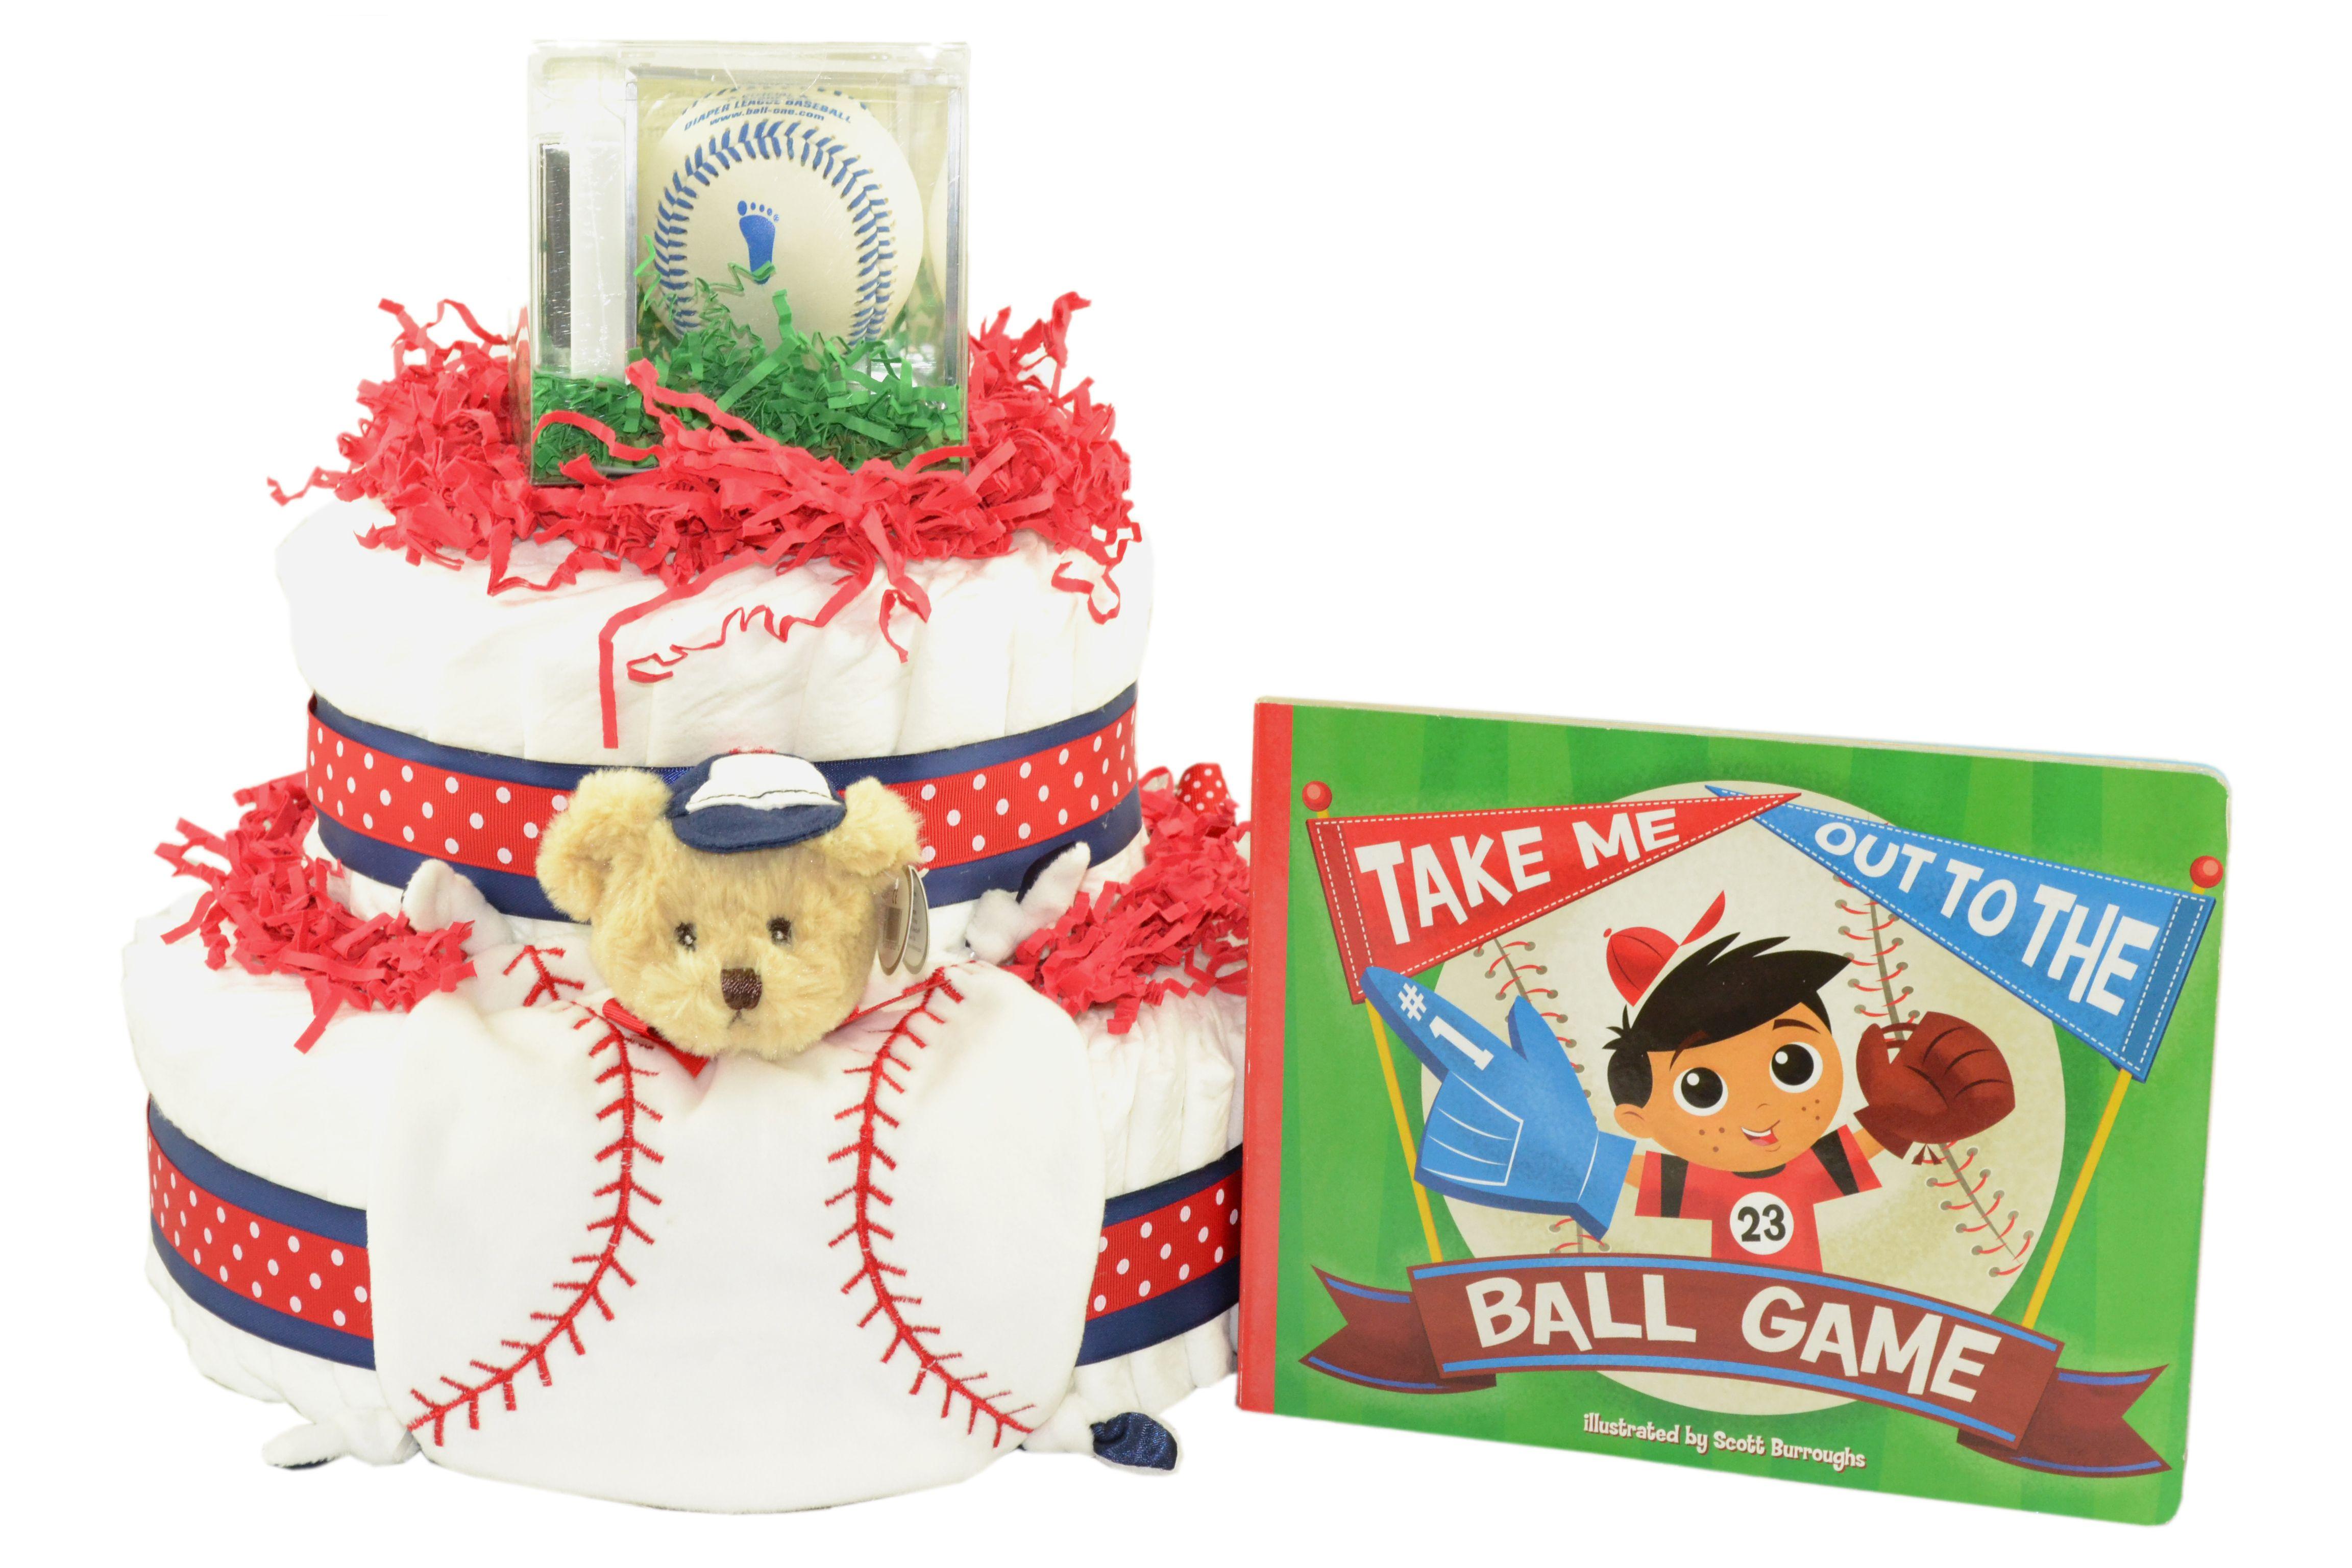 Lil Slugger Baseball Diaper Cake (BOOK INCLUDED)  http://www.nycdiapercakes.com/lil-slugger-baseball-diaper-cake-book-inclucde.html